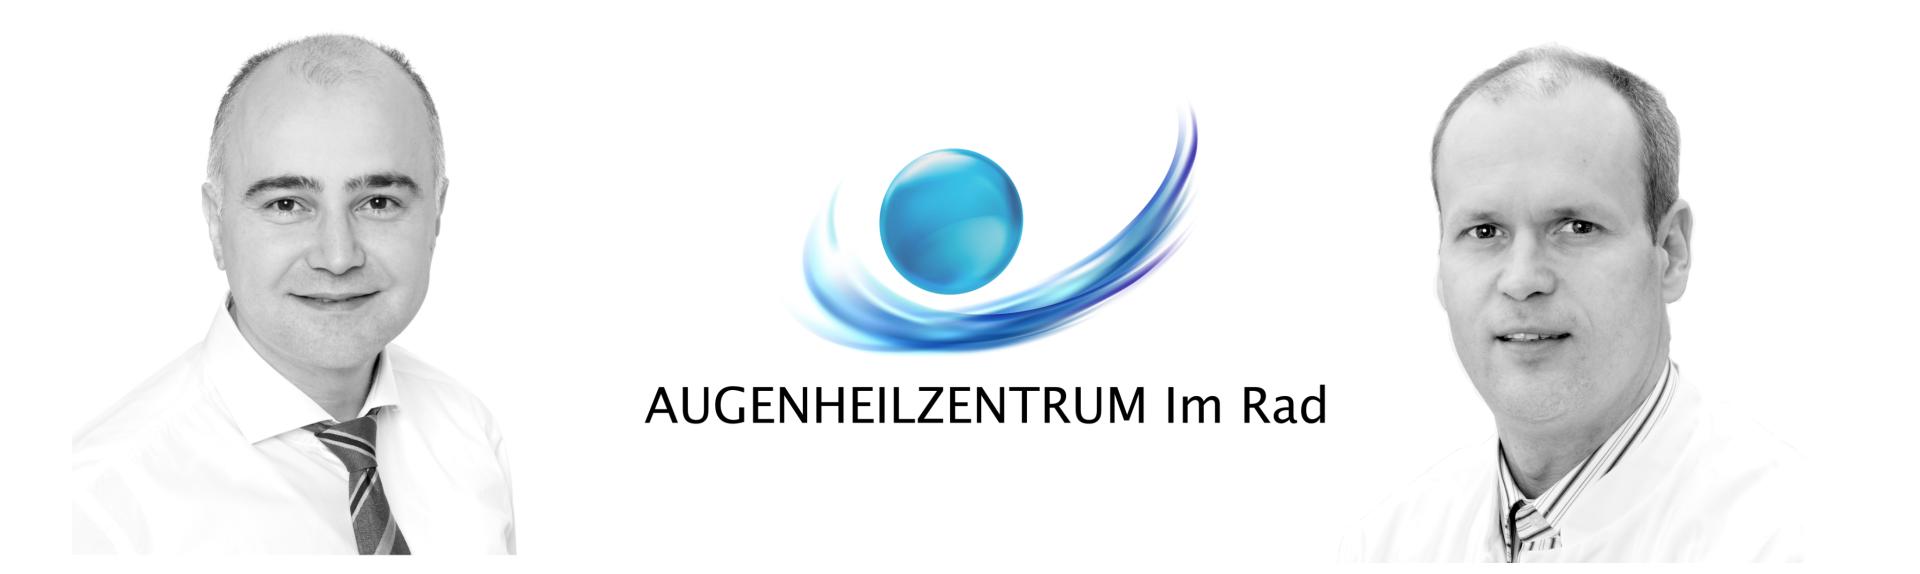 Augenarzt Wiesbaden ambulante OP augenklinik